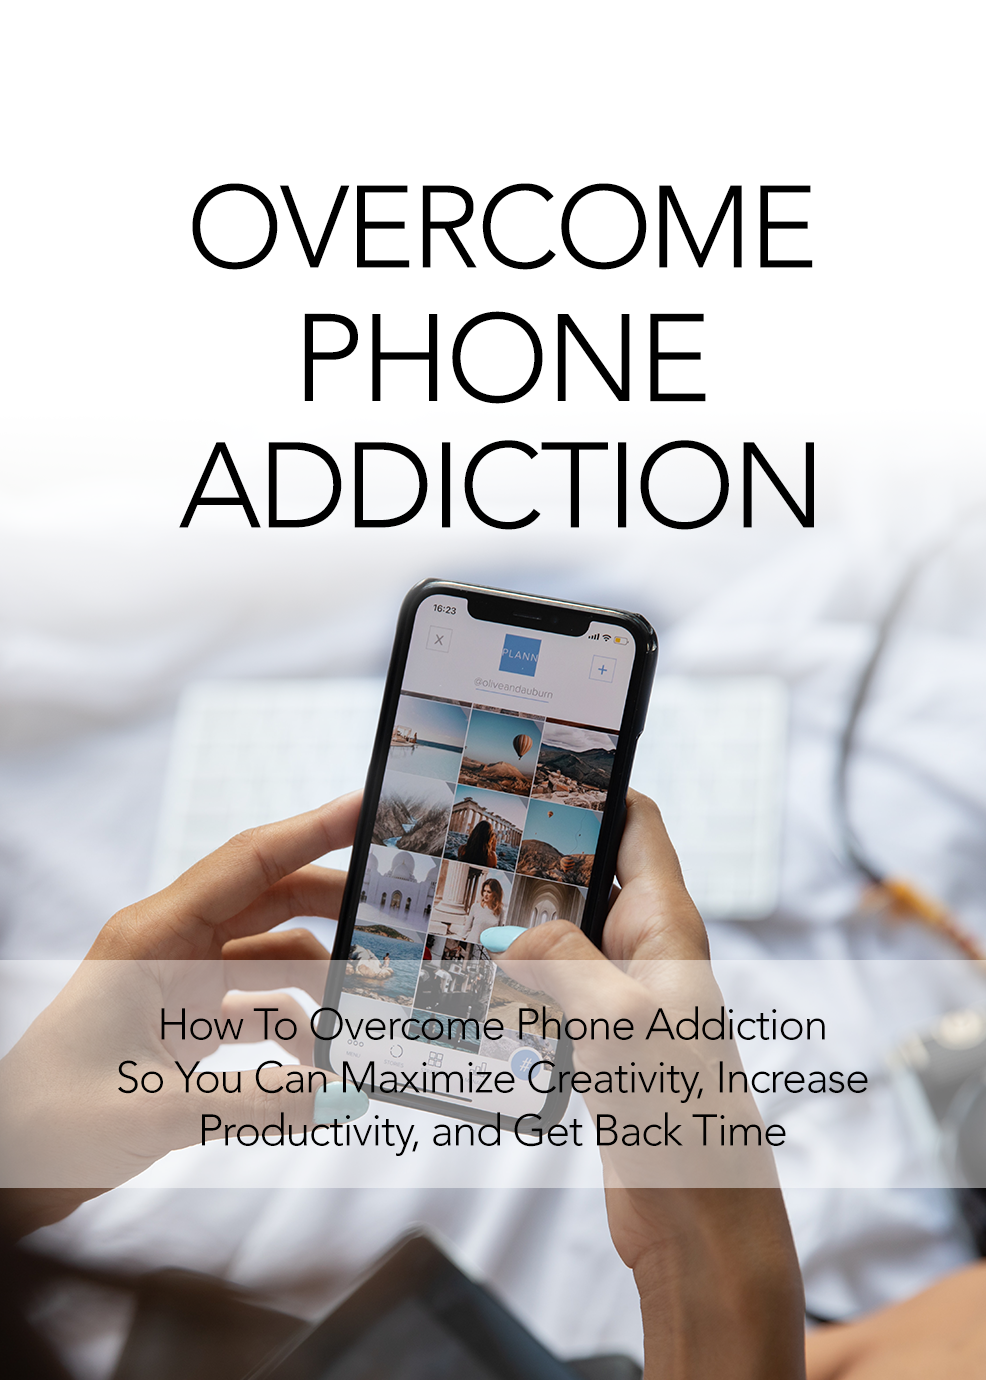 Overcome Phone Addiction eBook's Book Image